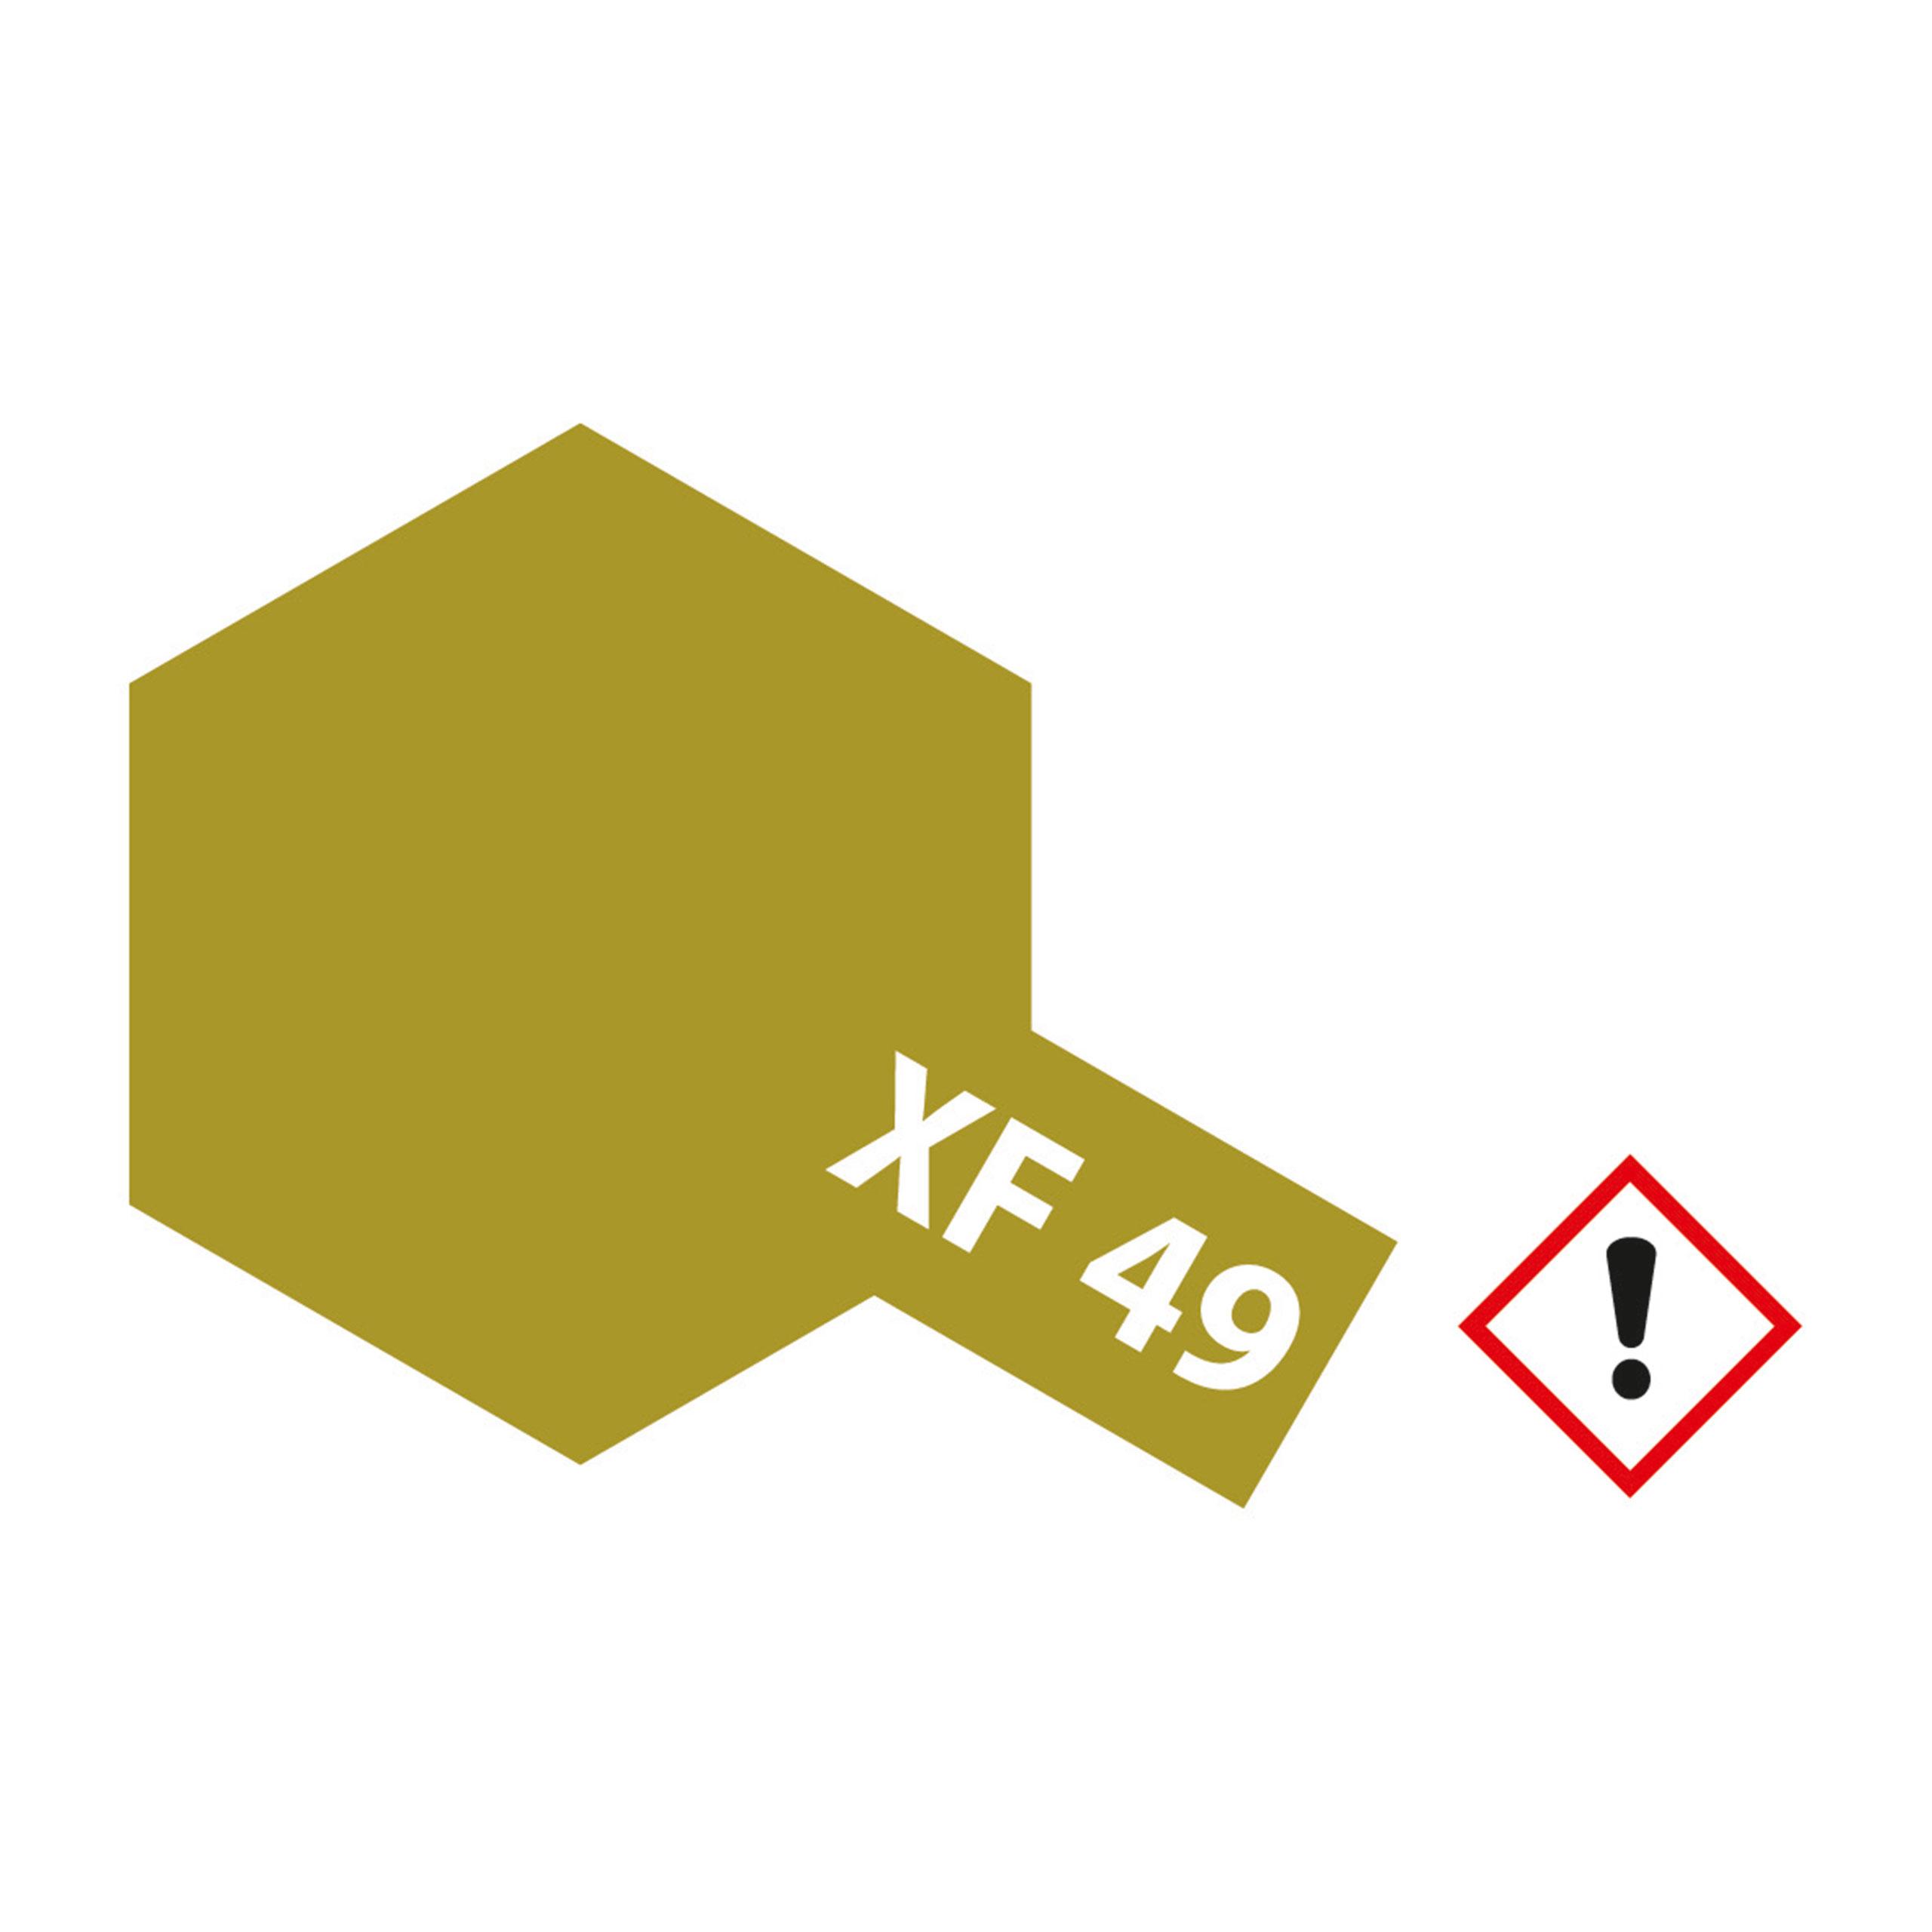 XF-49 Khaki matt - 23ml Acrylstreichfarbe wasserloeslich Tamiya 300081349